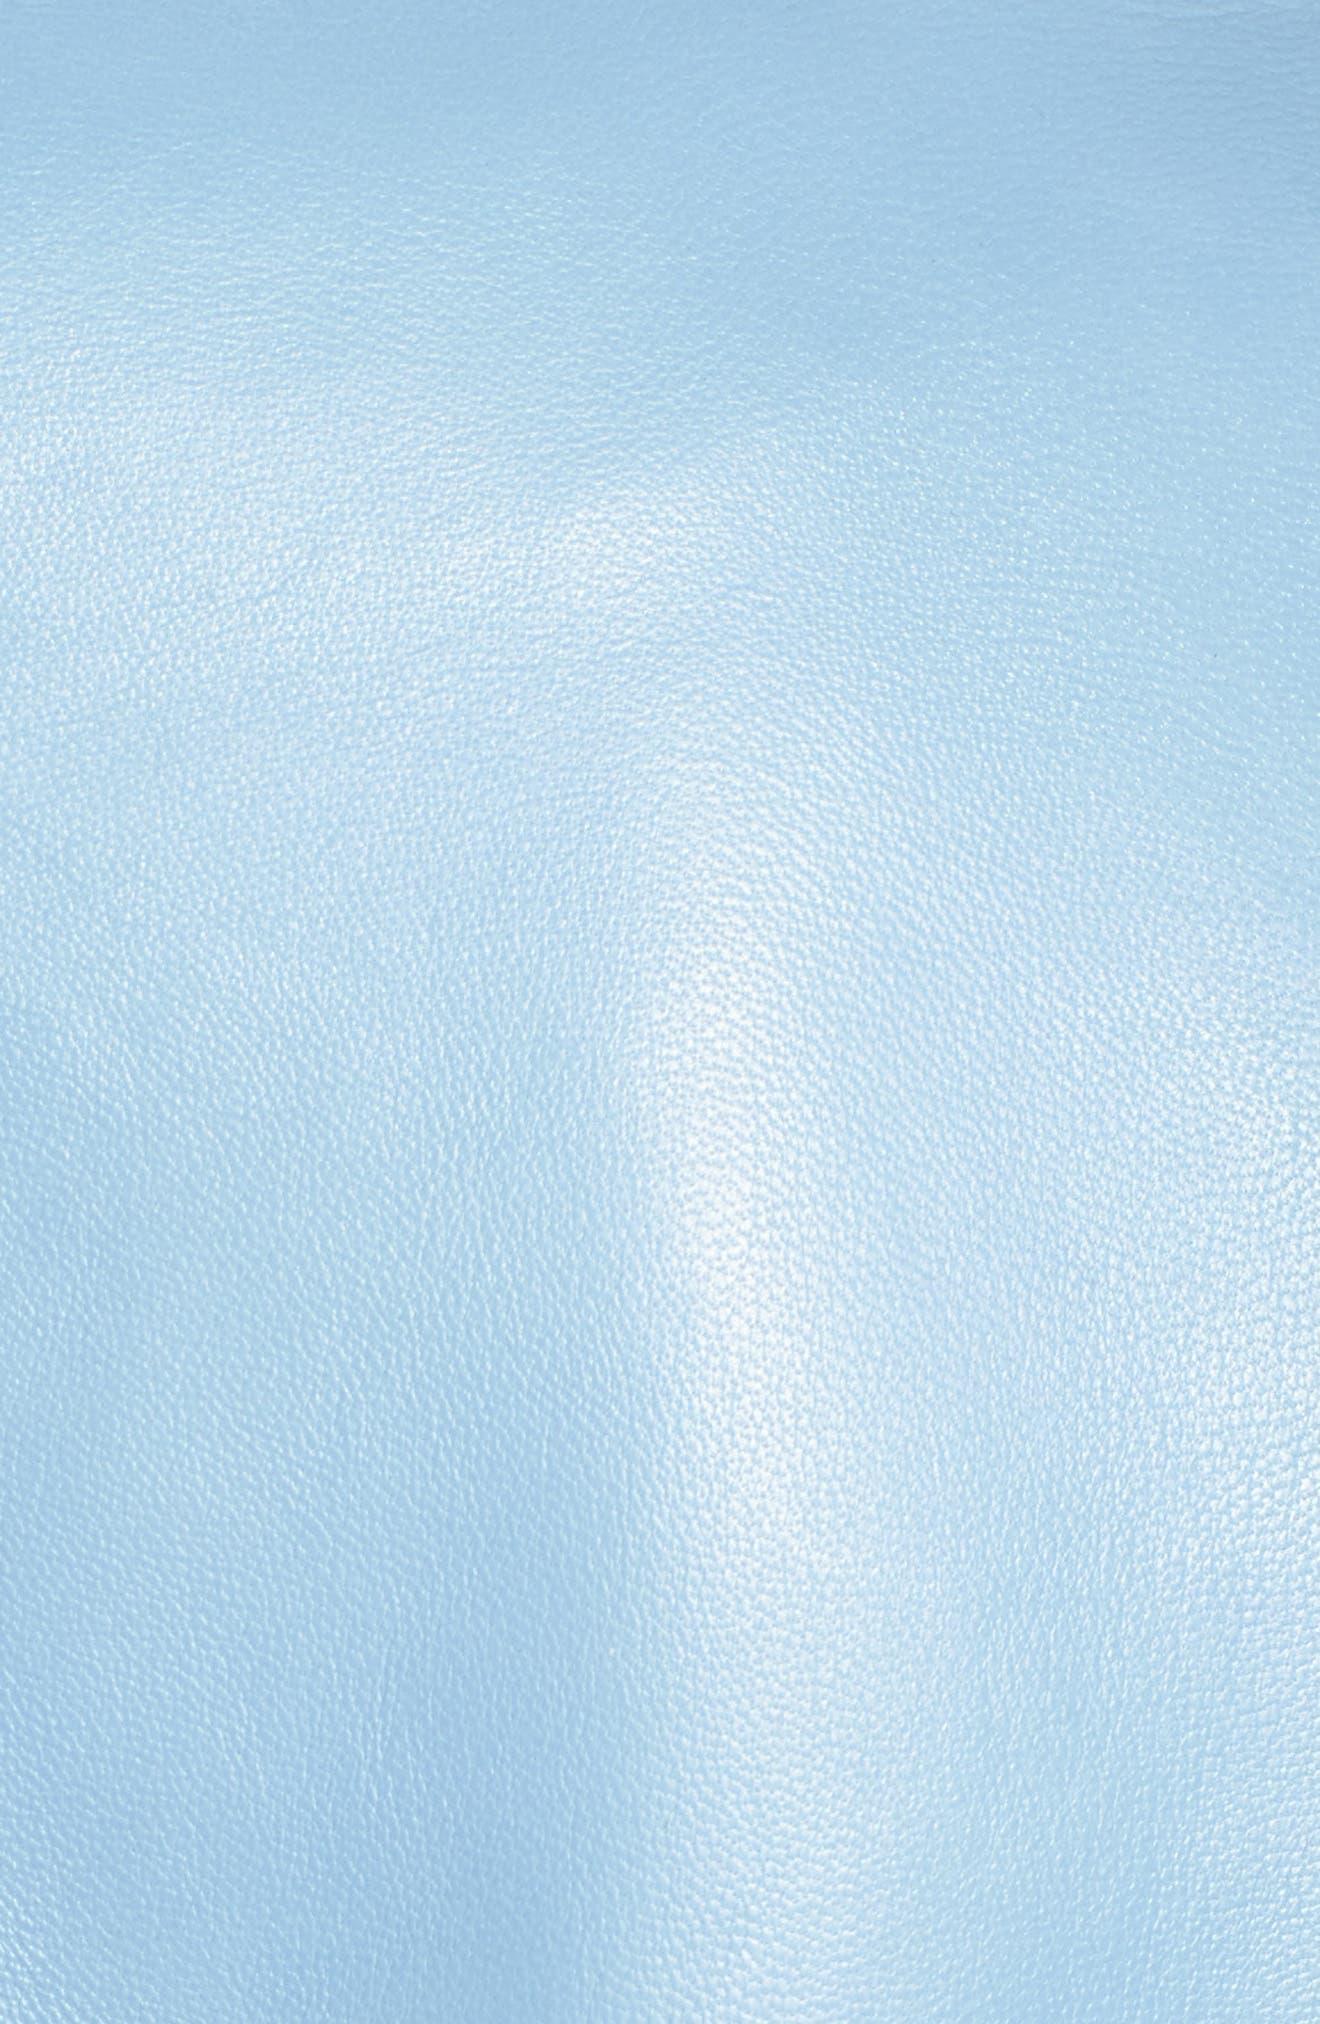 Donna Lambskin Leather Moto Jacket,                             Alternate thumbnail 5, color,                             POWDER BLUE